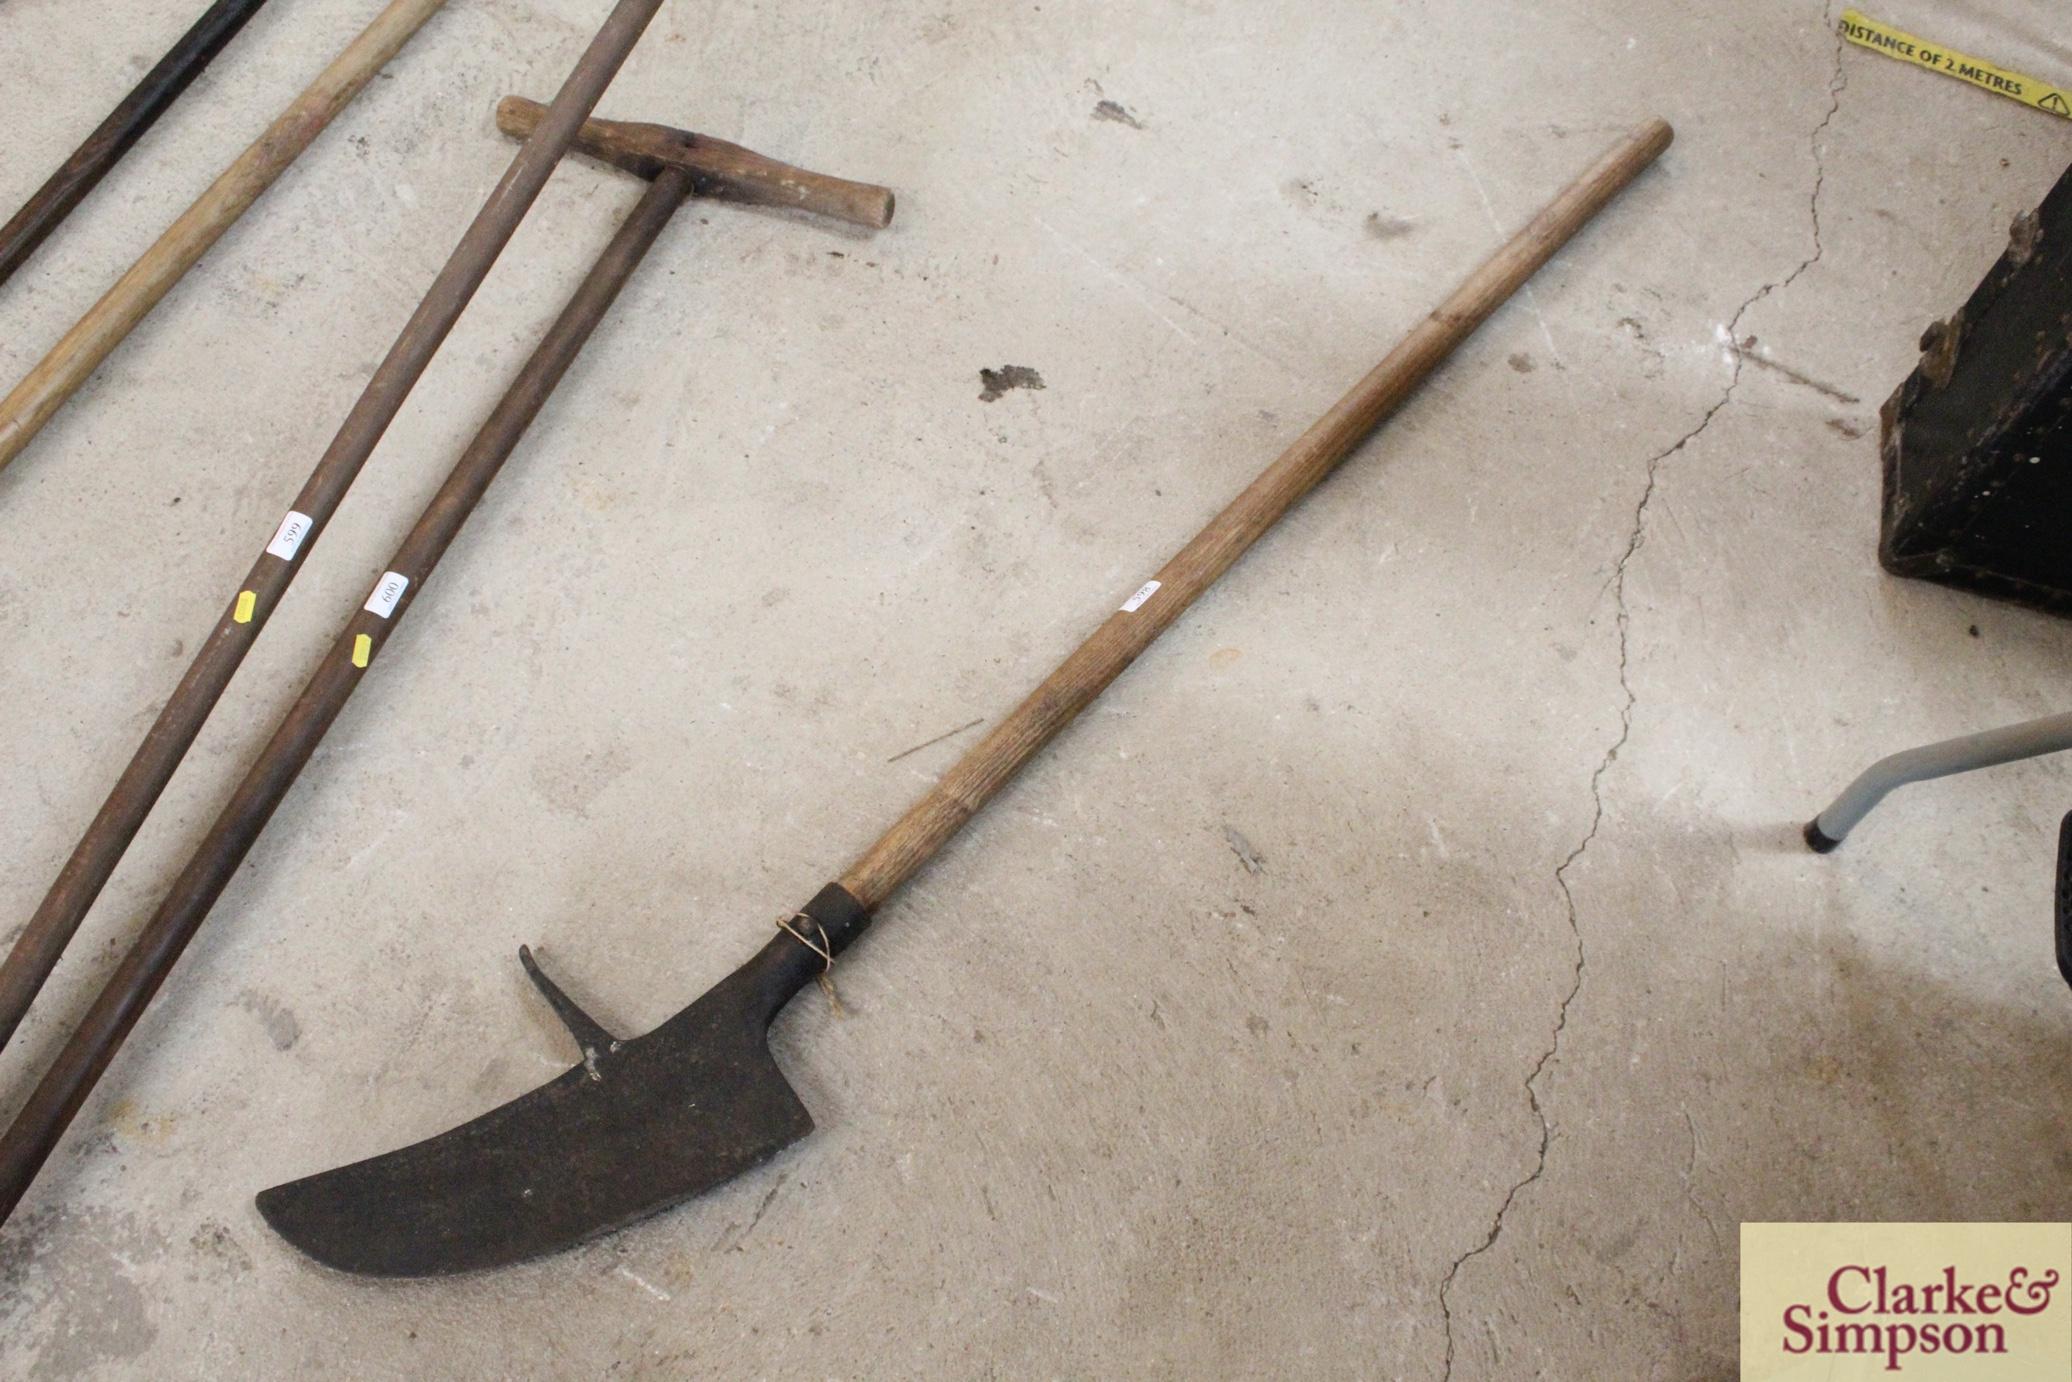 A thatcher's / peat cutter's tool